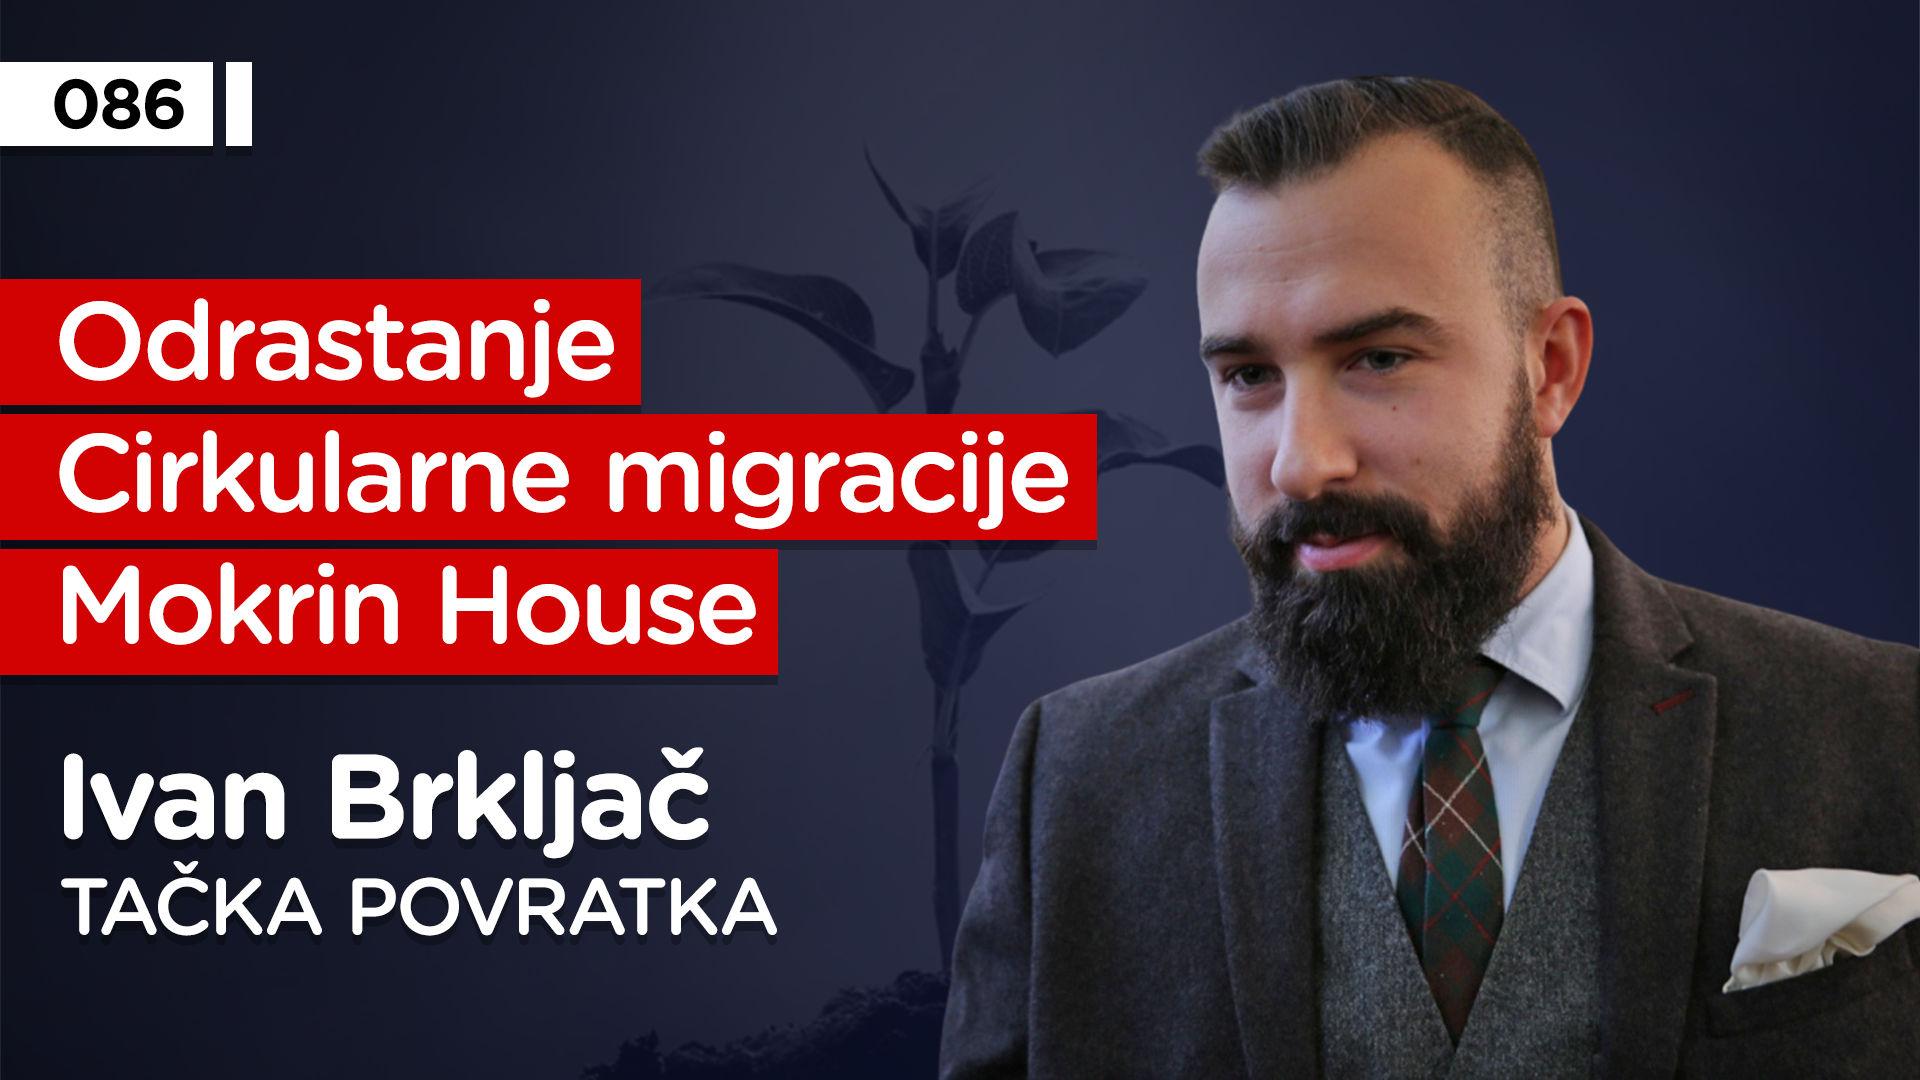 EP086: Ivan Brkljač